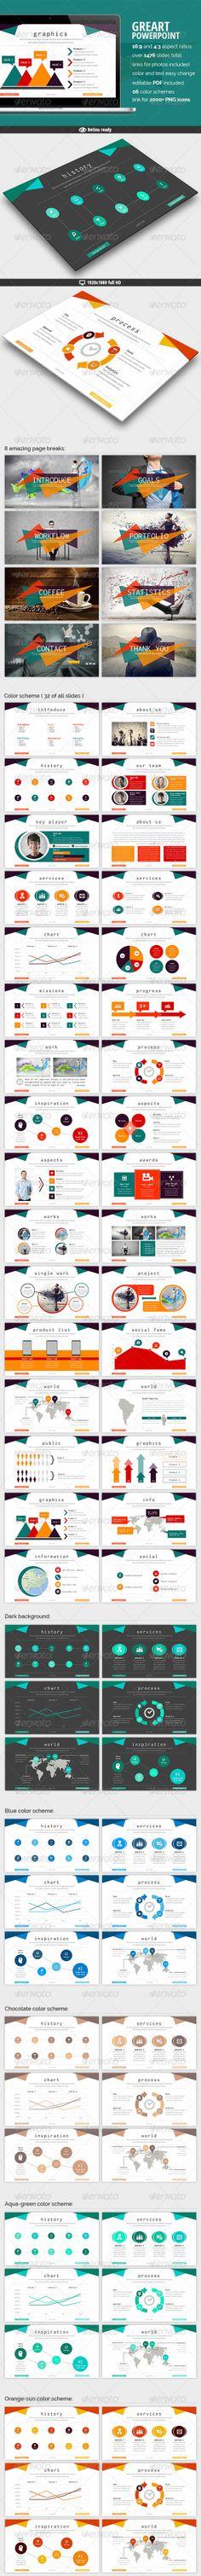 Greart - Powerpoint Presentation - Creative Powerpoint Templates